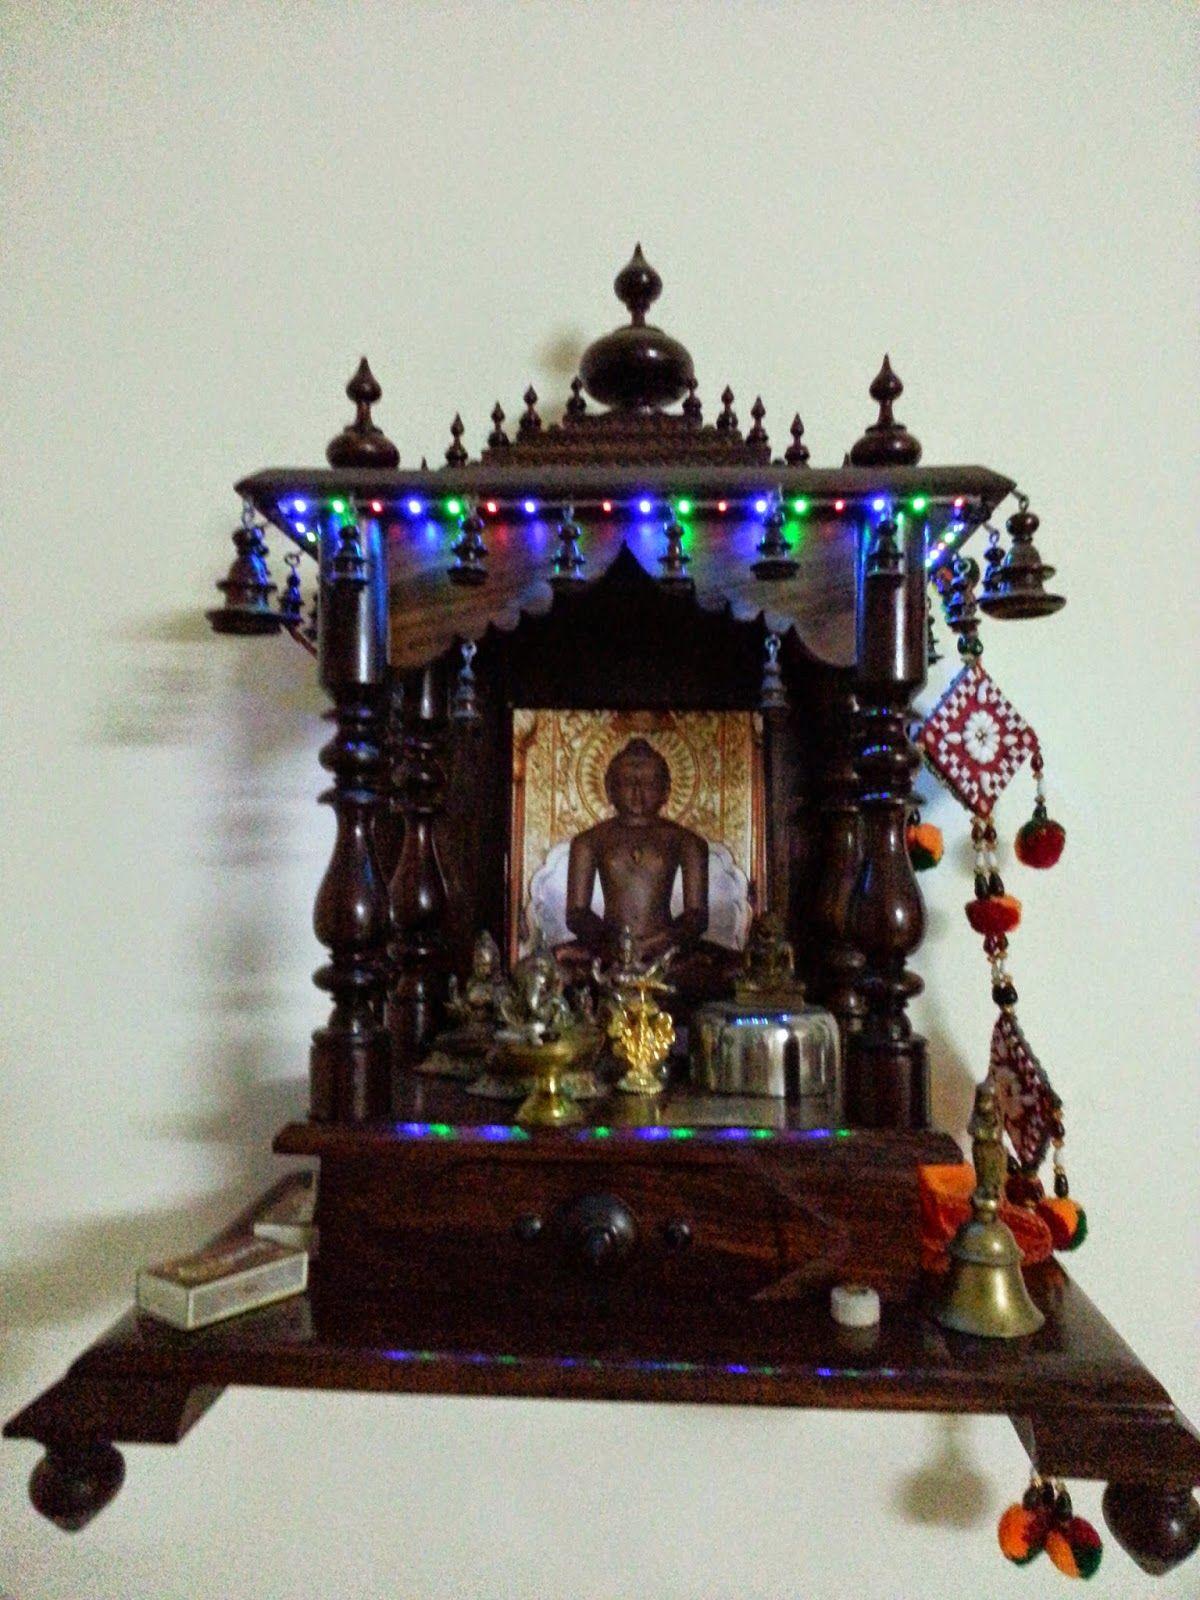 Amit Jain Blog Decorate Your Home Mandir With Flickering